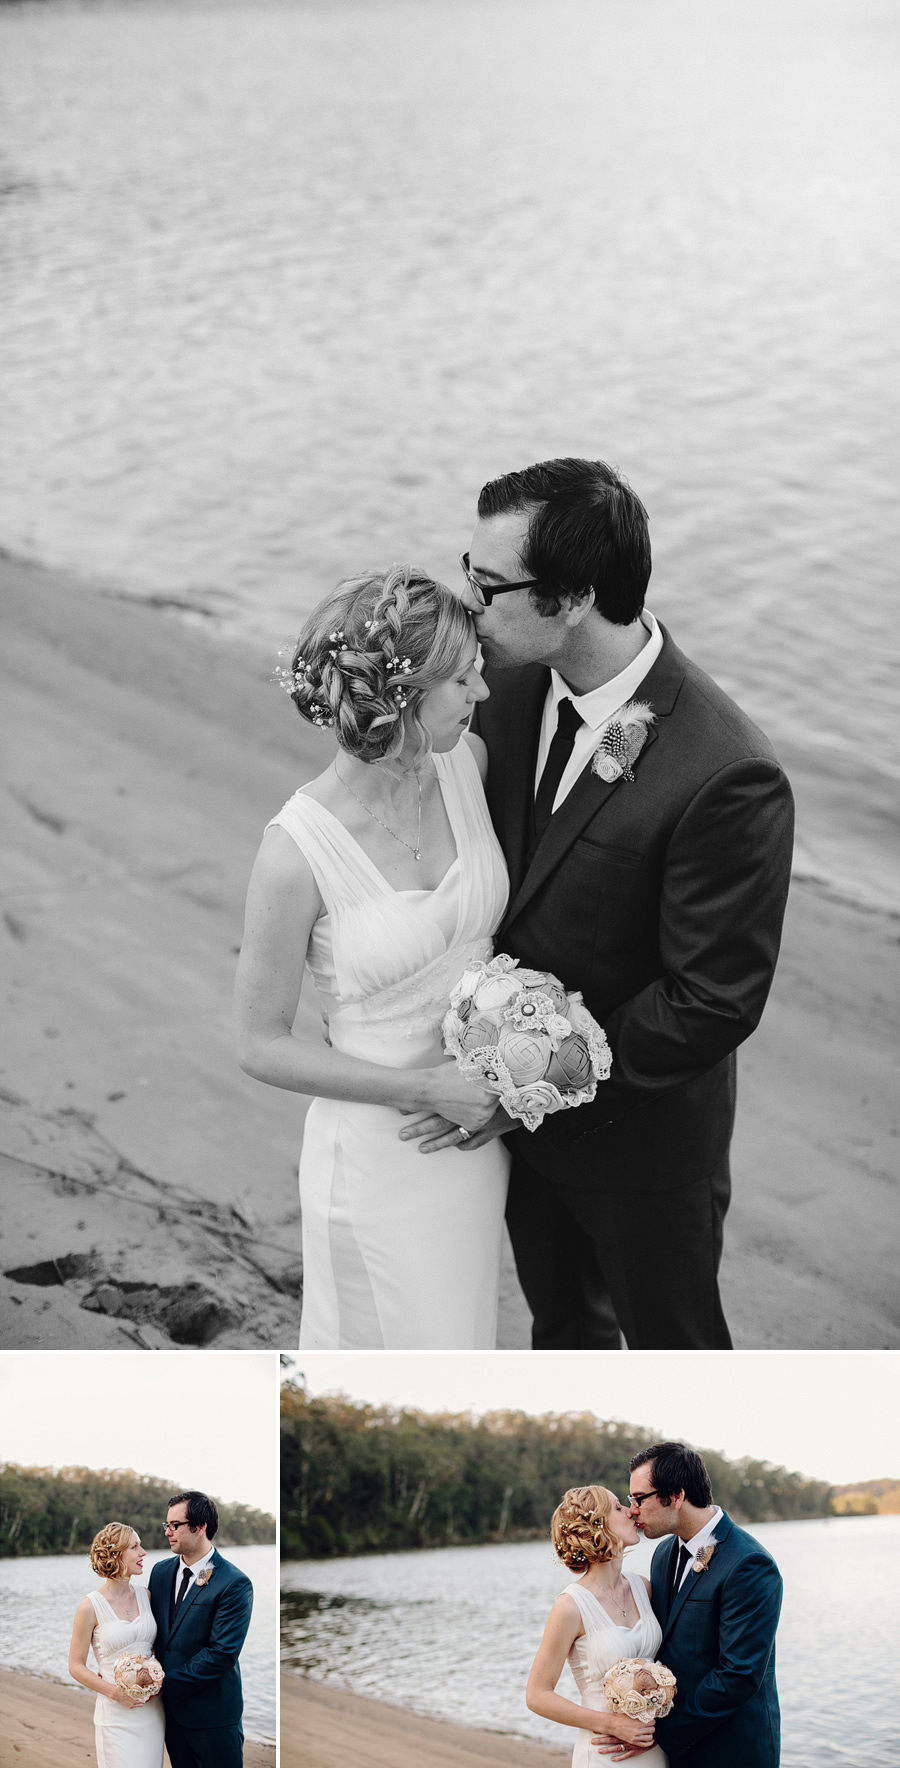 Blue Mountains Wedding Photography: Portraits